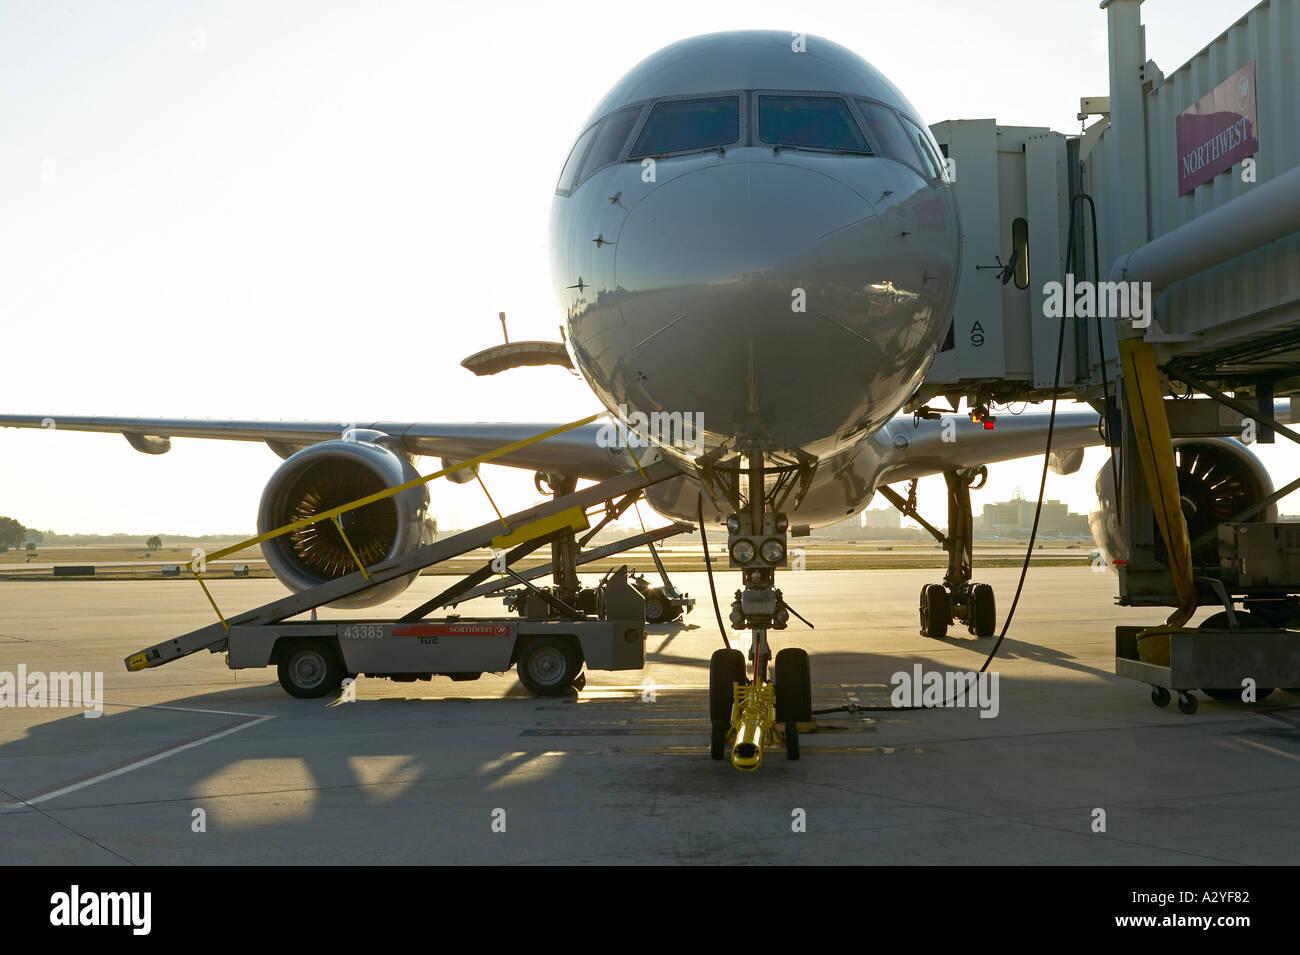 Northwest passenger jet airplane docked at airside - Stock Image